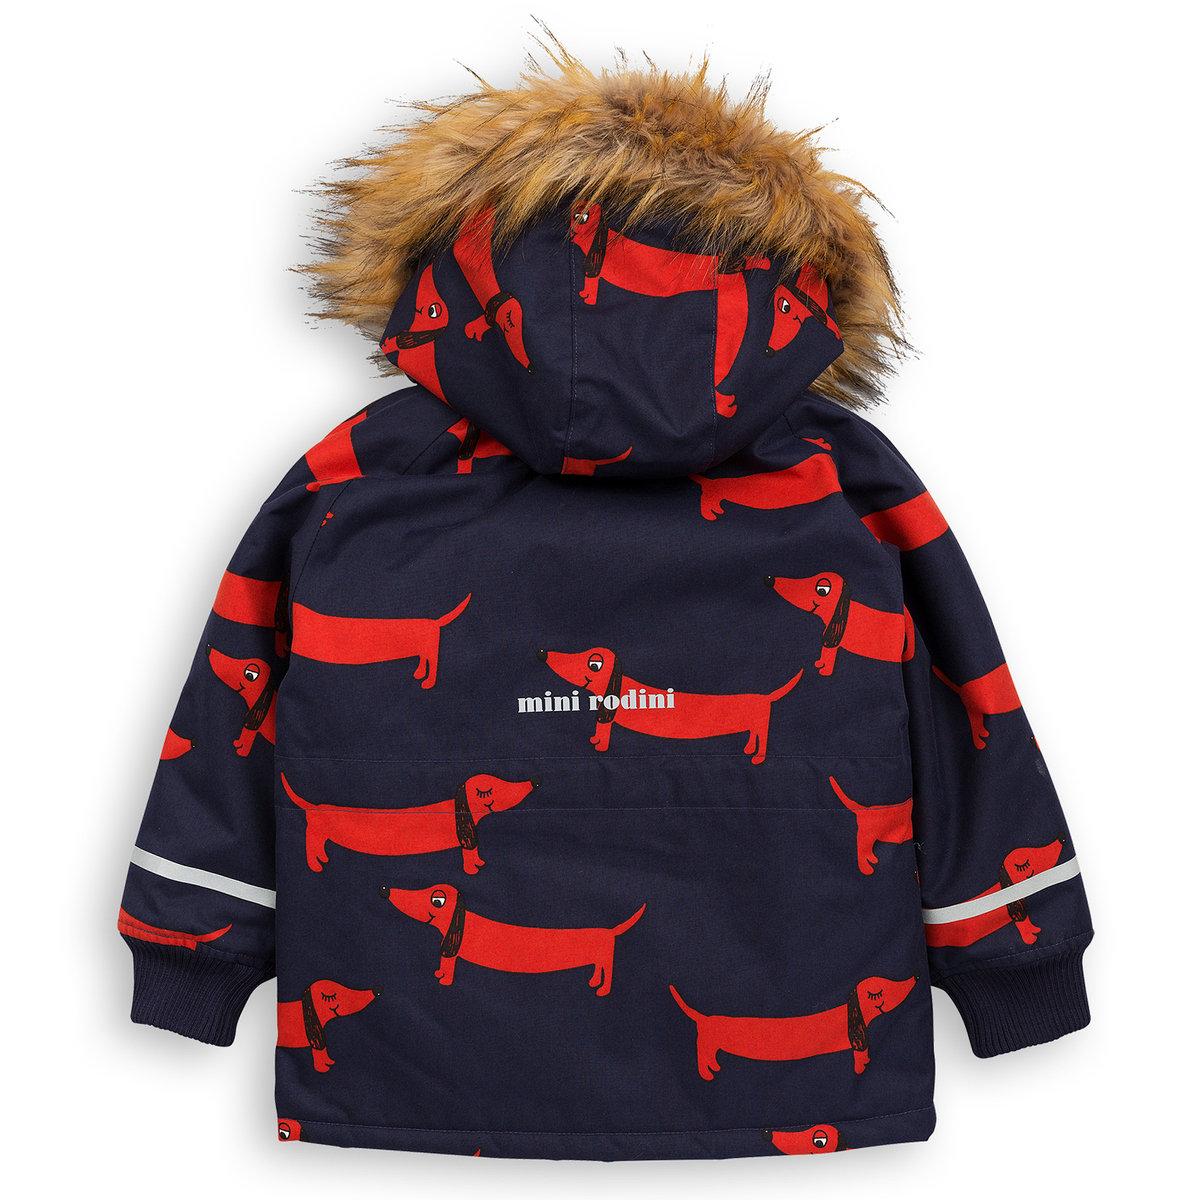 c874d8b0296c9f K2 Dog Winter Waterproof Jacket | Mini Rodini Jackets & Coats ...